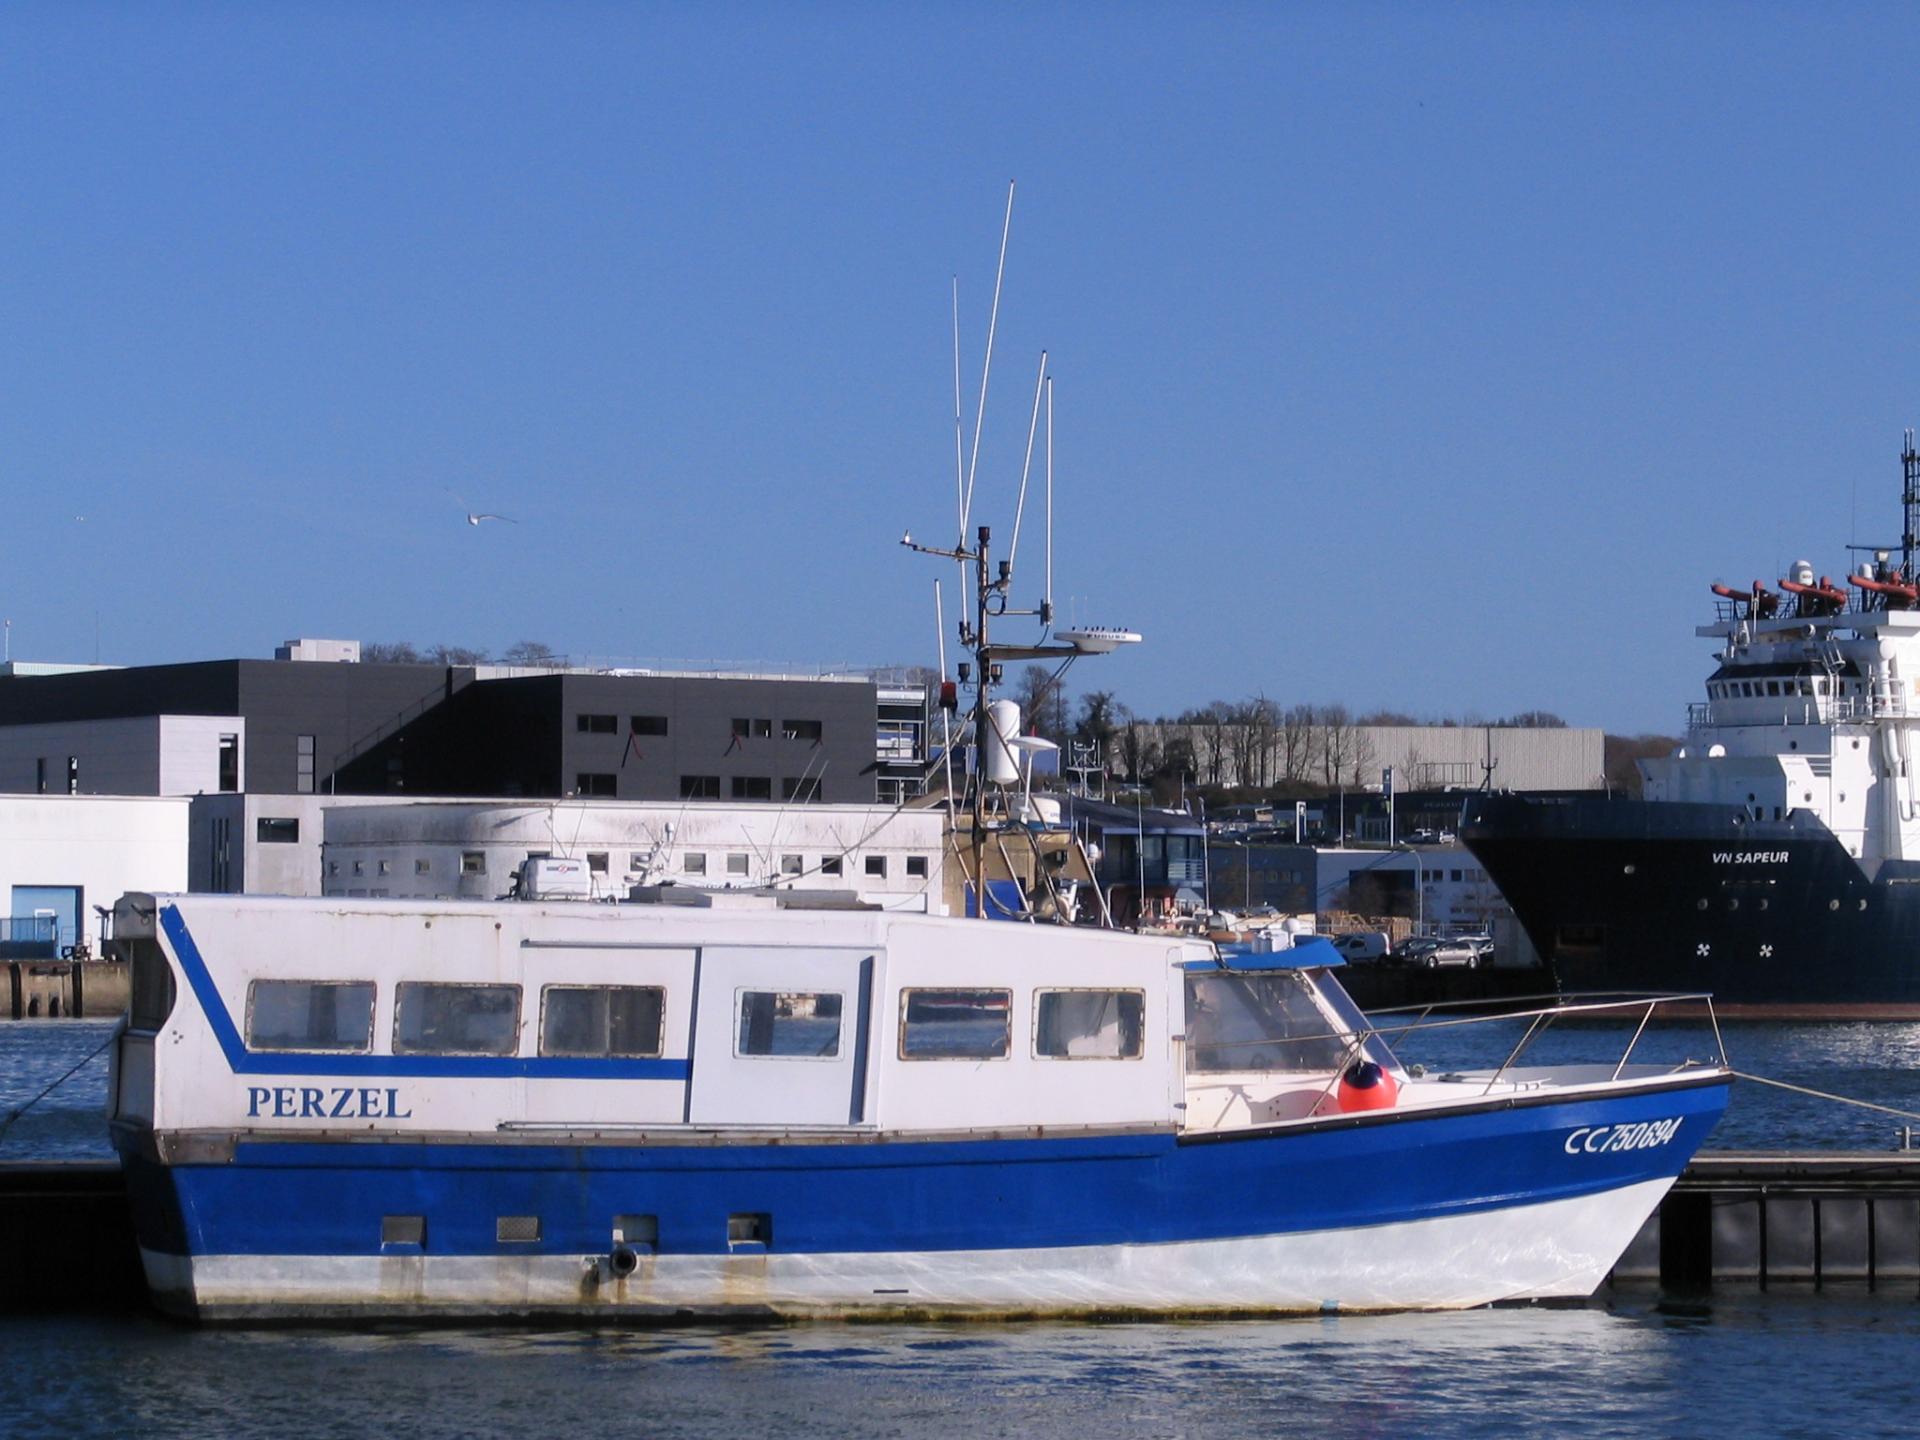 200120 perzel cc